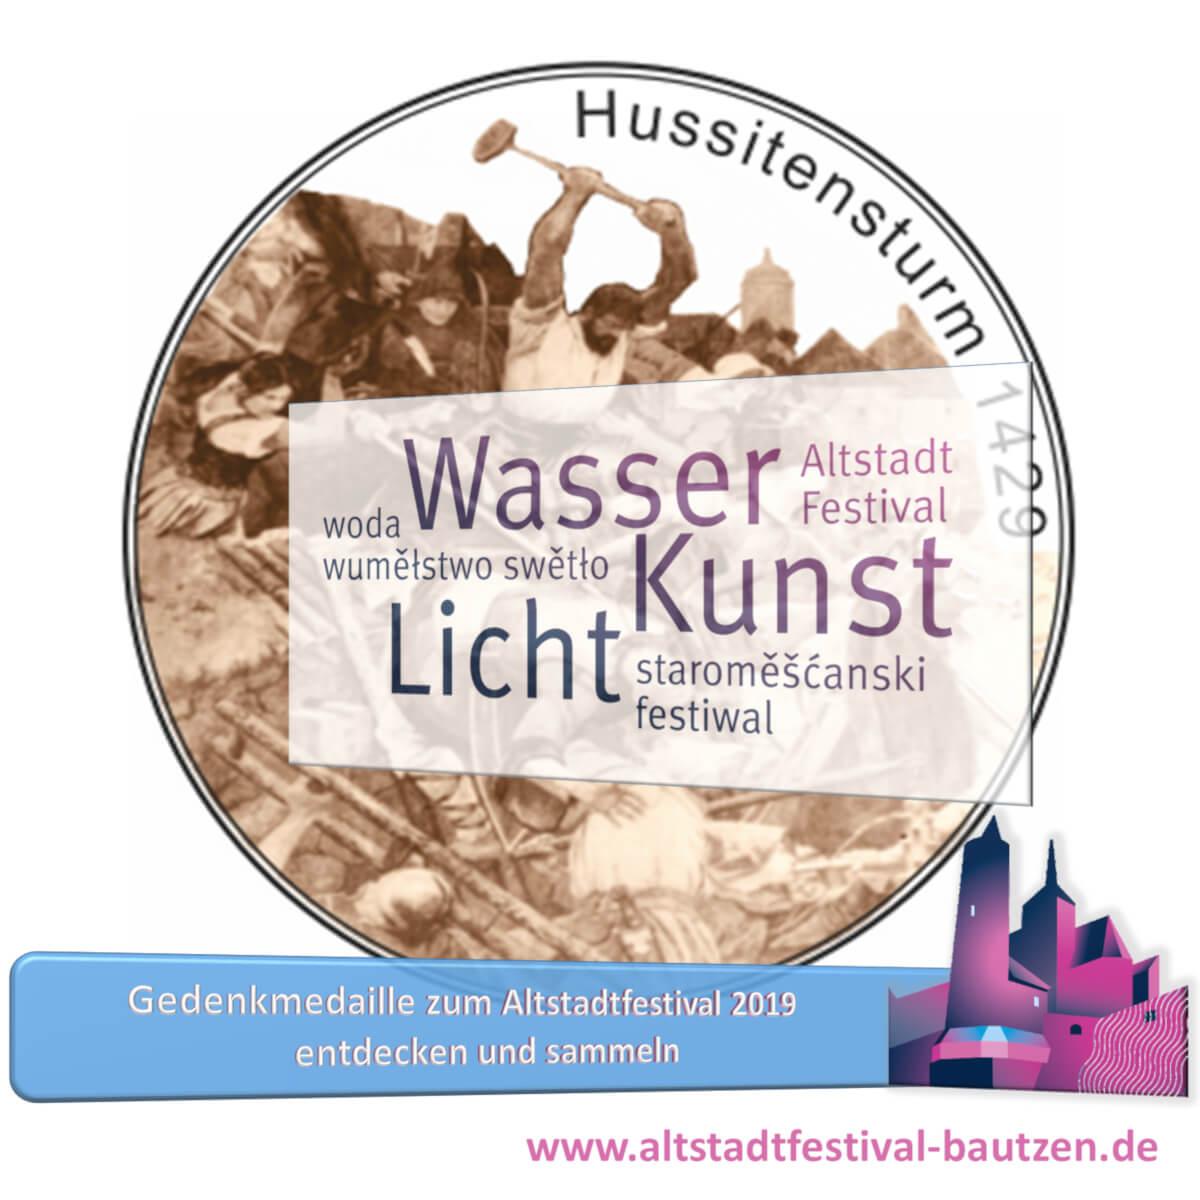 Beitragsbild Gedenkmedaille zum Altstadtfestival 2019